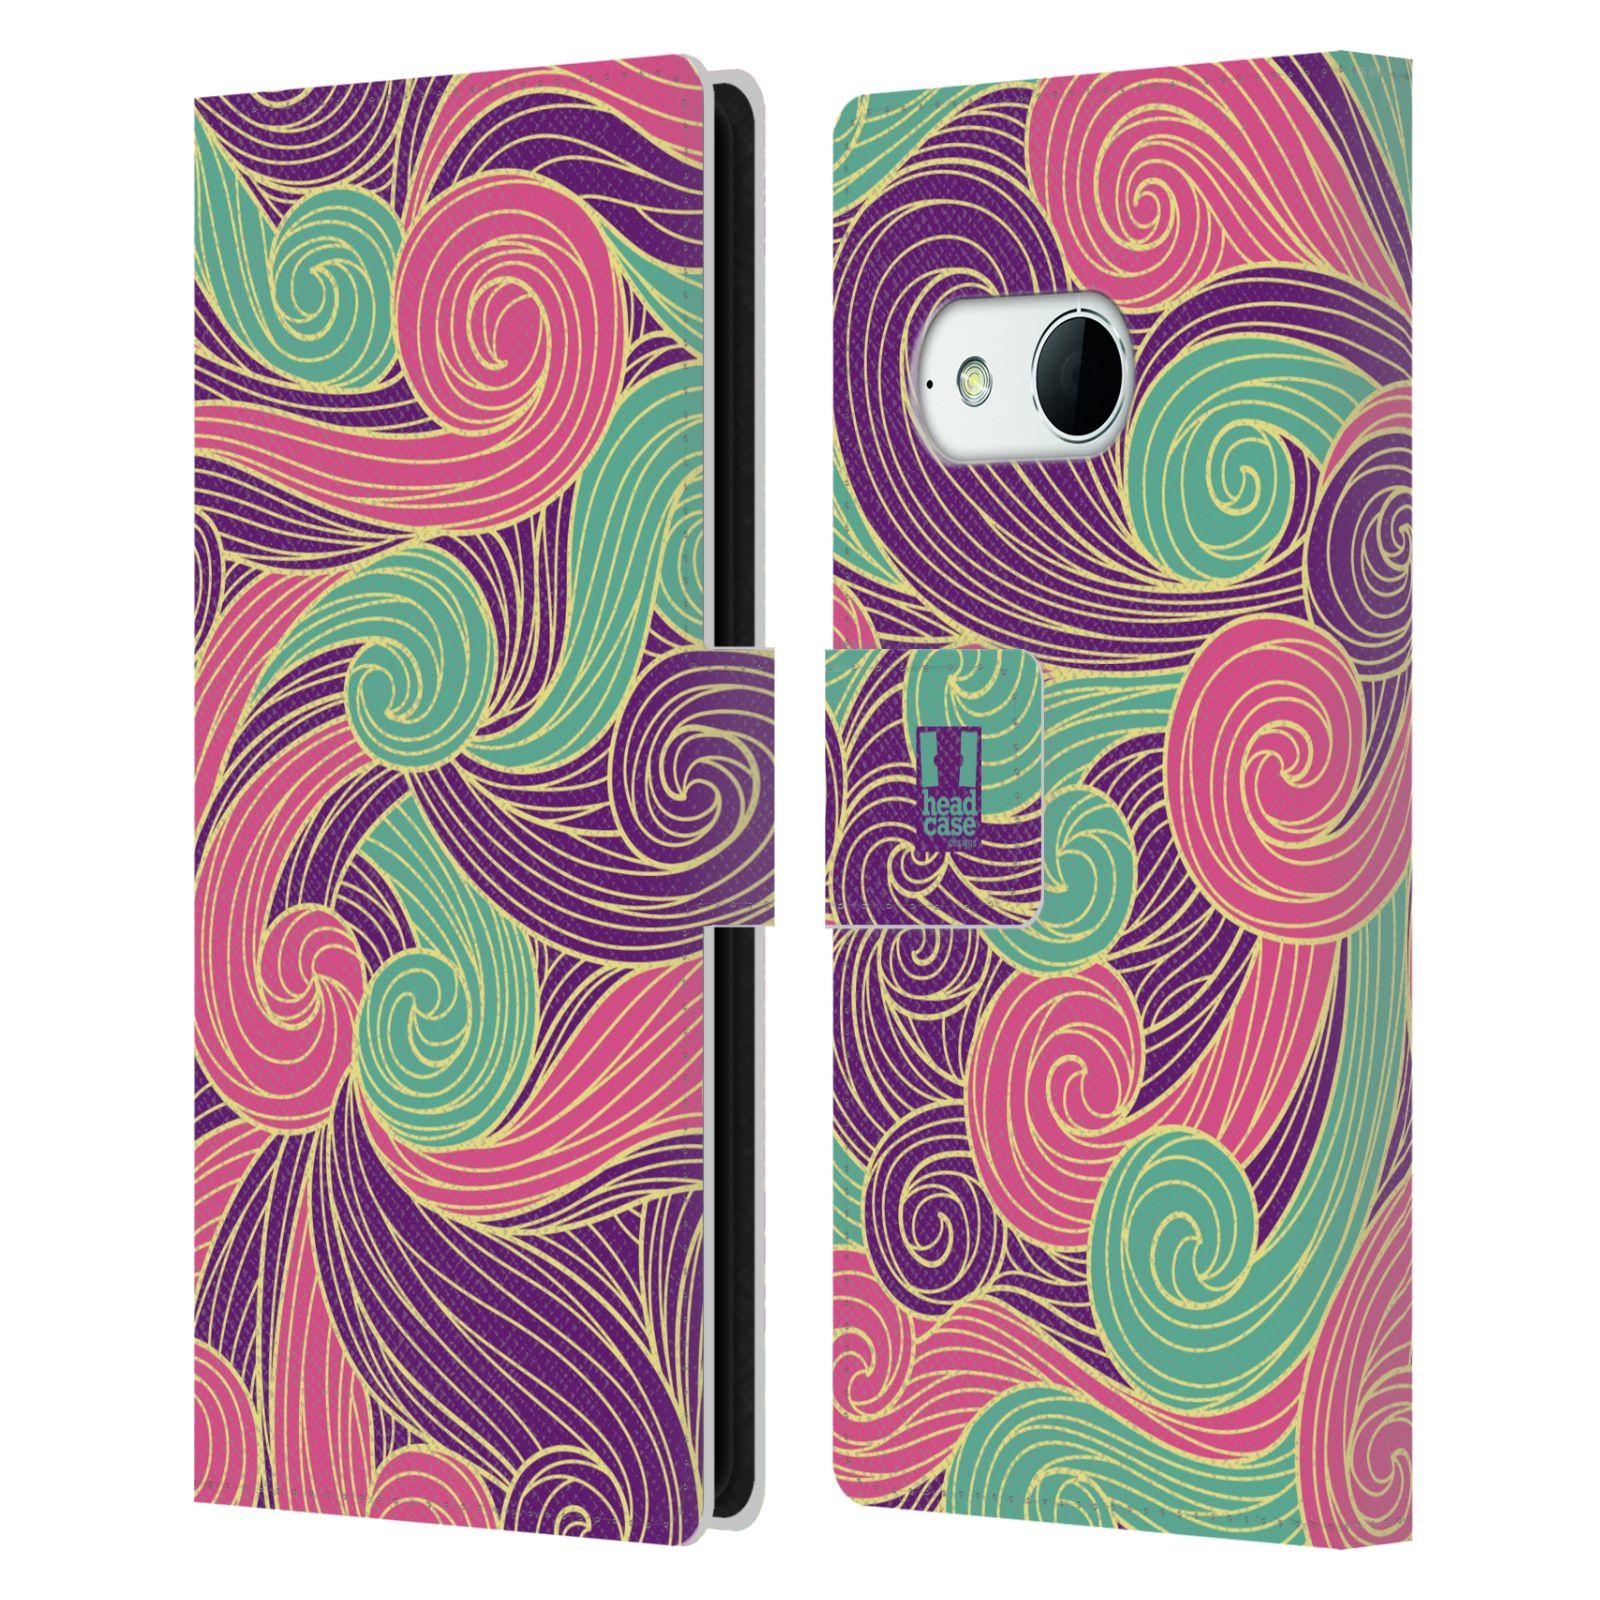 HEAD CASE Flipové pouzdro pro mobil HTC ONE MINI 2 (M8) barevné vlny růžová a fialová